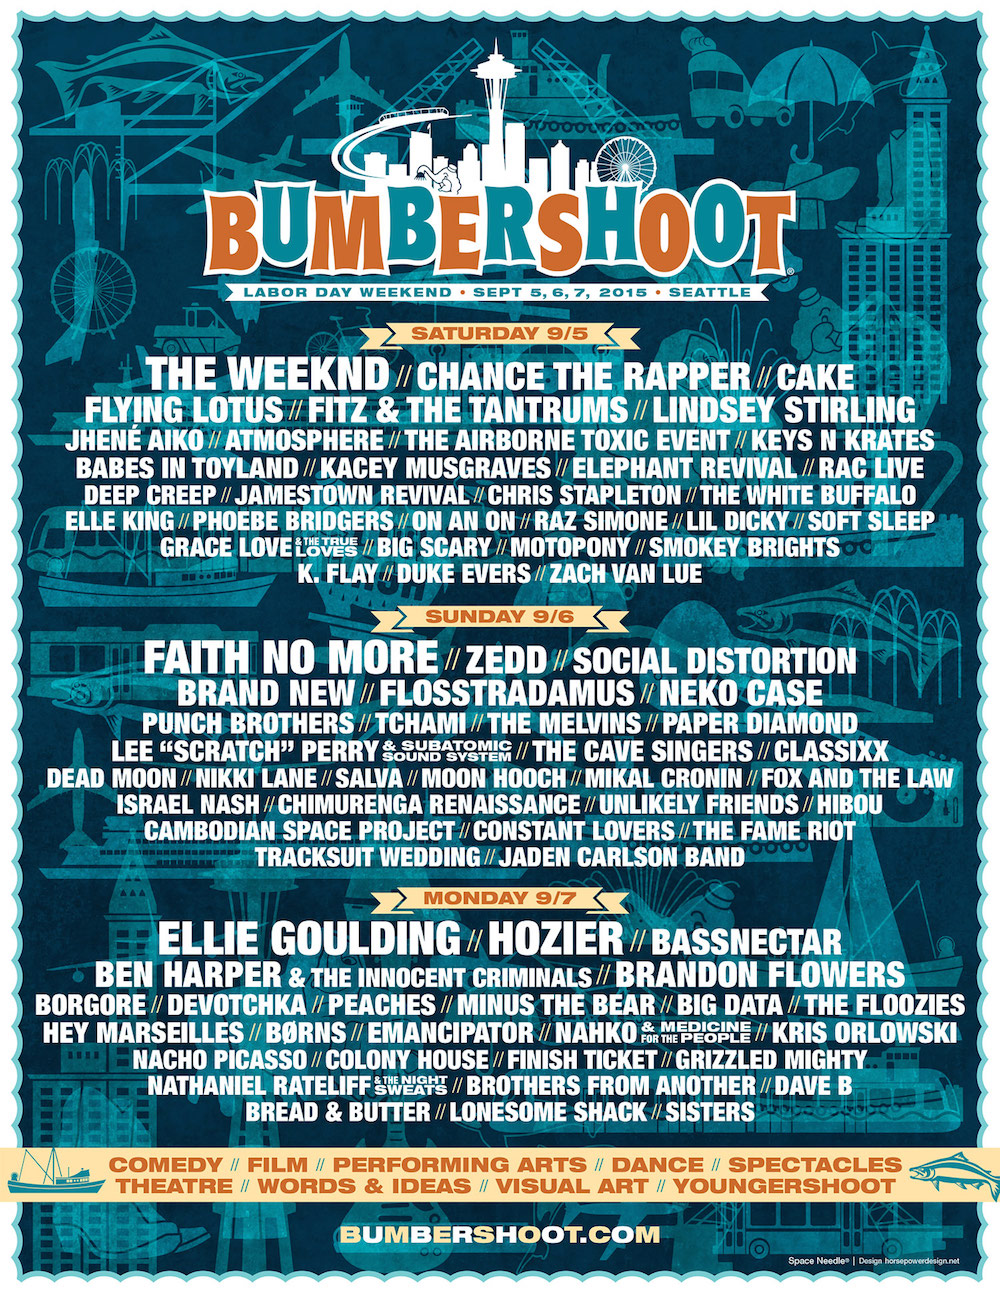 Bassnectar @ Bumbershoot 2015